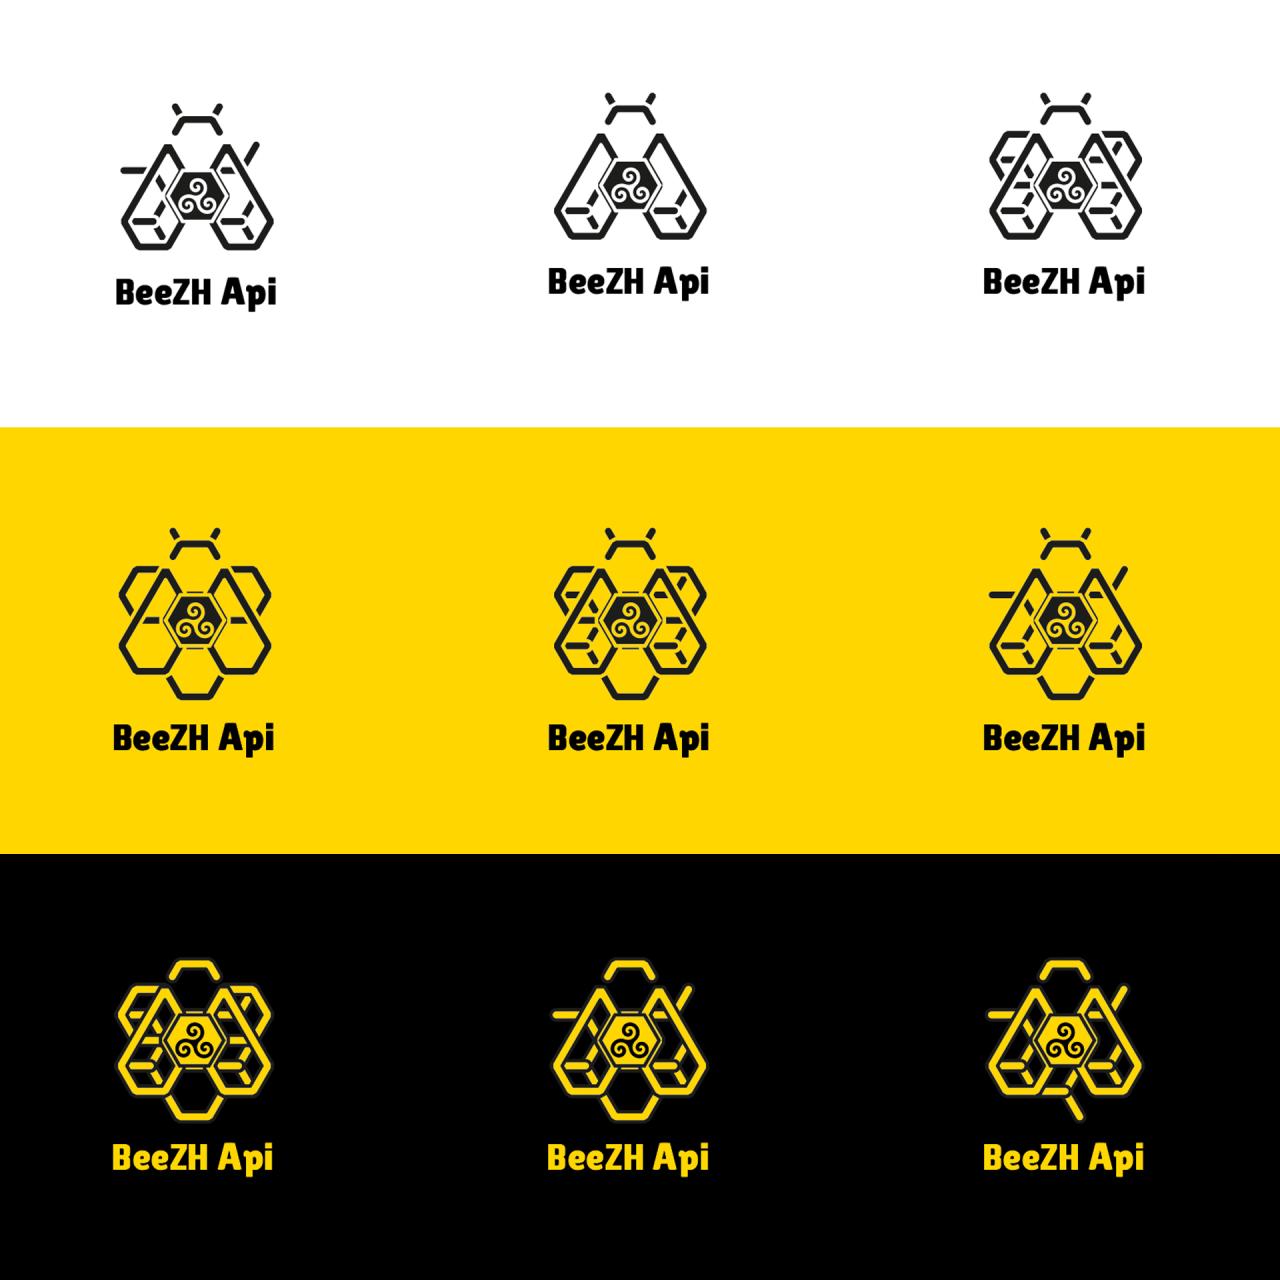 Pistes logo Beezh Api